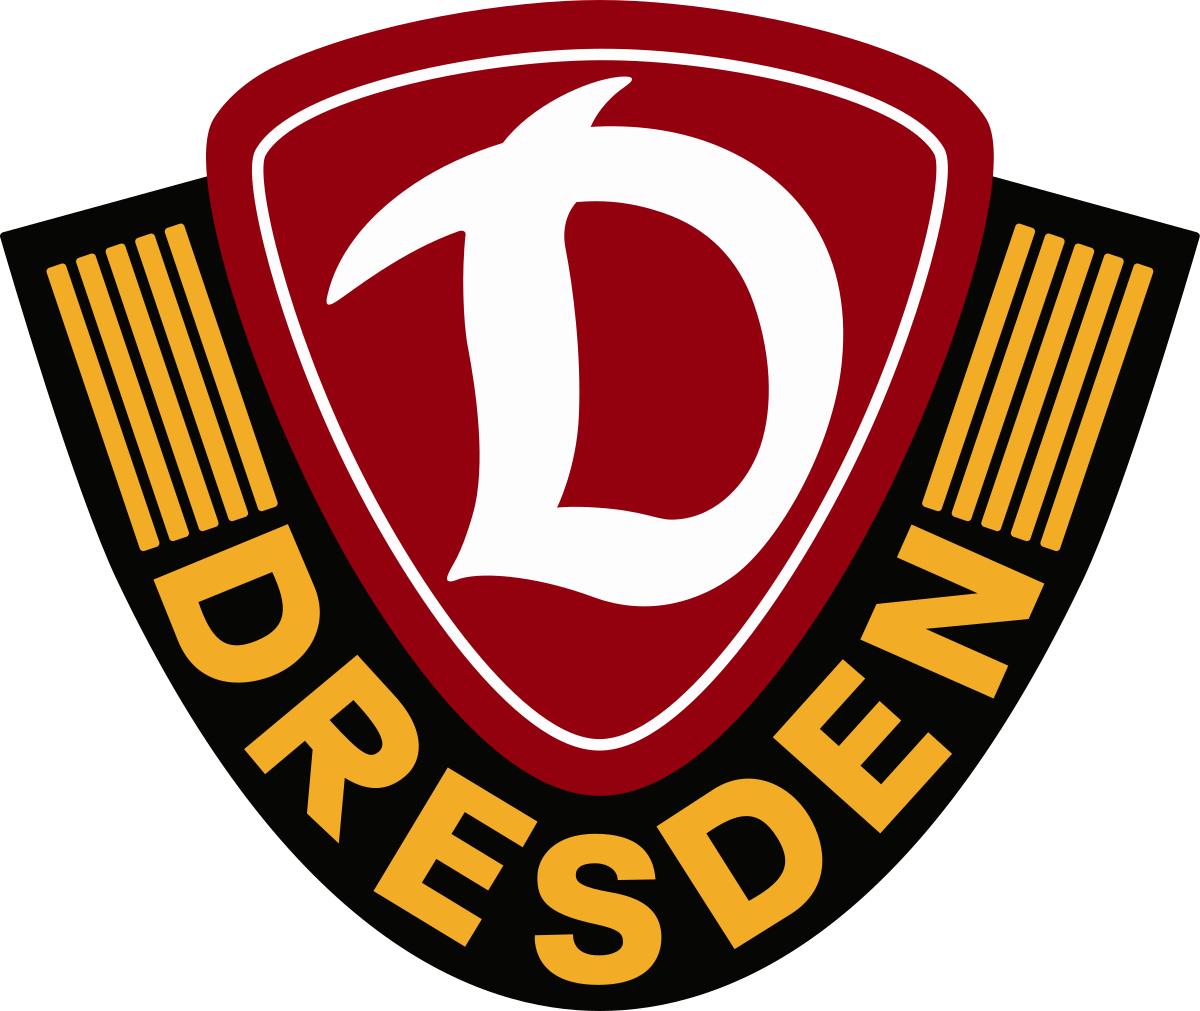 Dynamo Dresden - Fanshop / 20% auf fast alles / nur am 02.12.2019